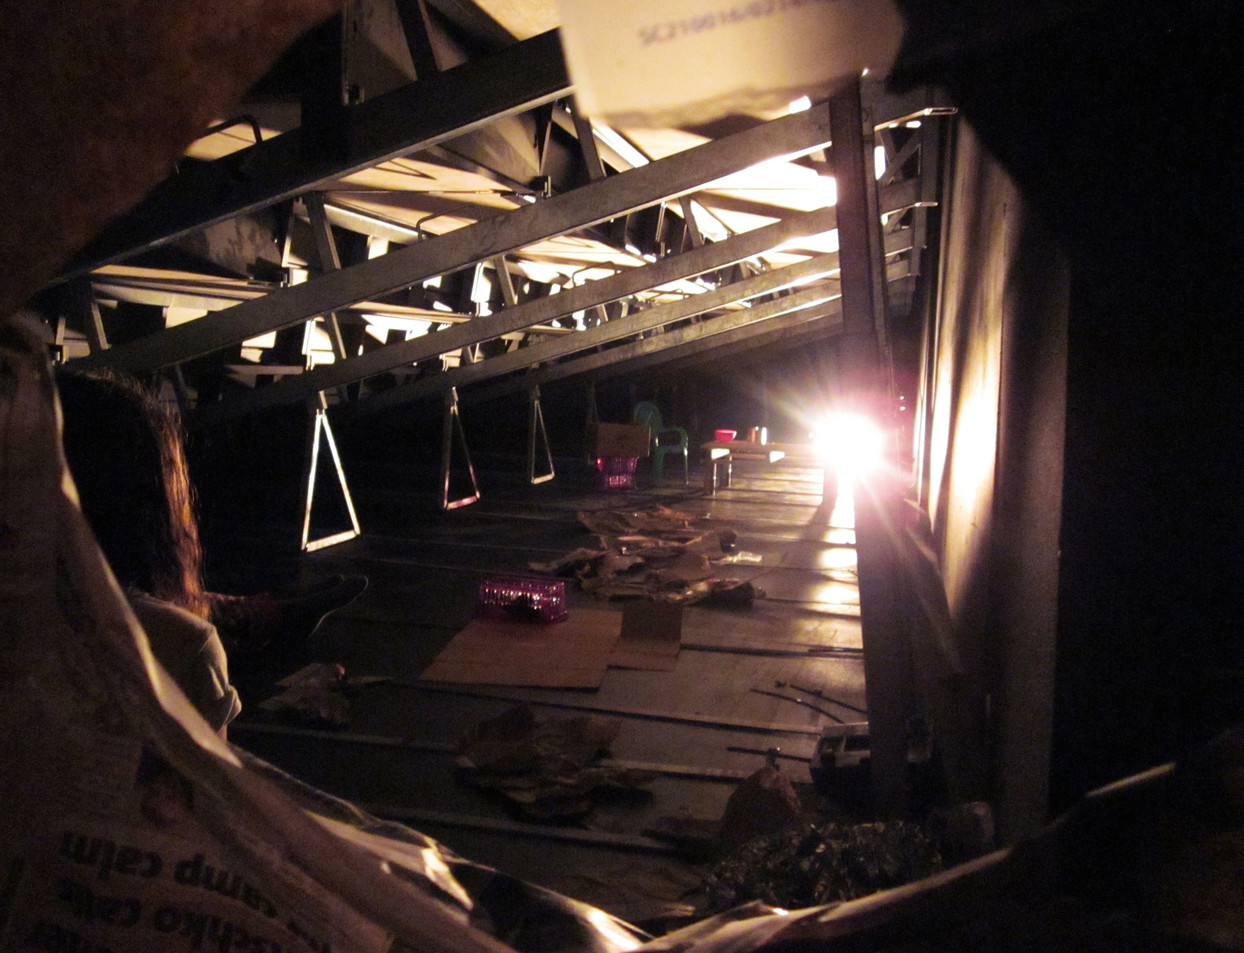 A Tree, Hit the Ground theatre, The Barbican, London, a developmental piece created by Lateisha Davine Lovelace Hanson